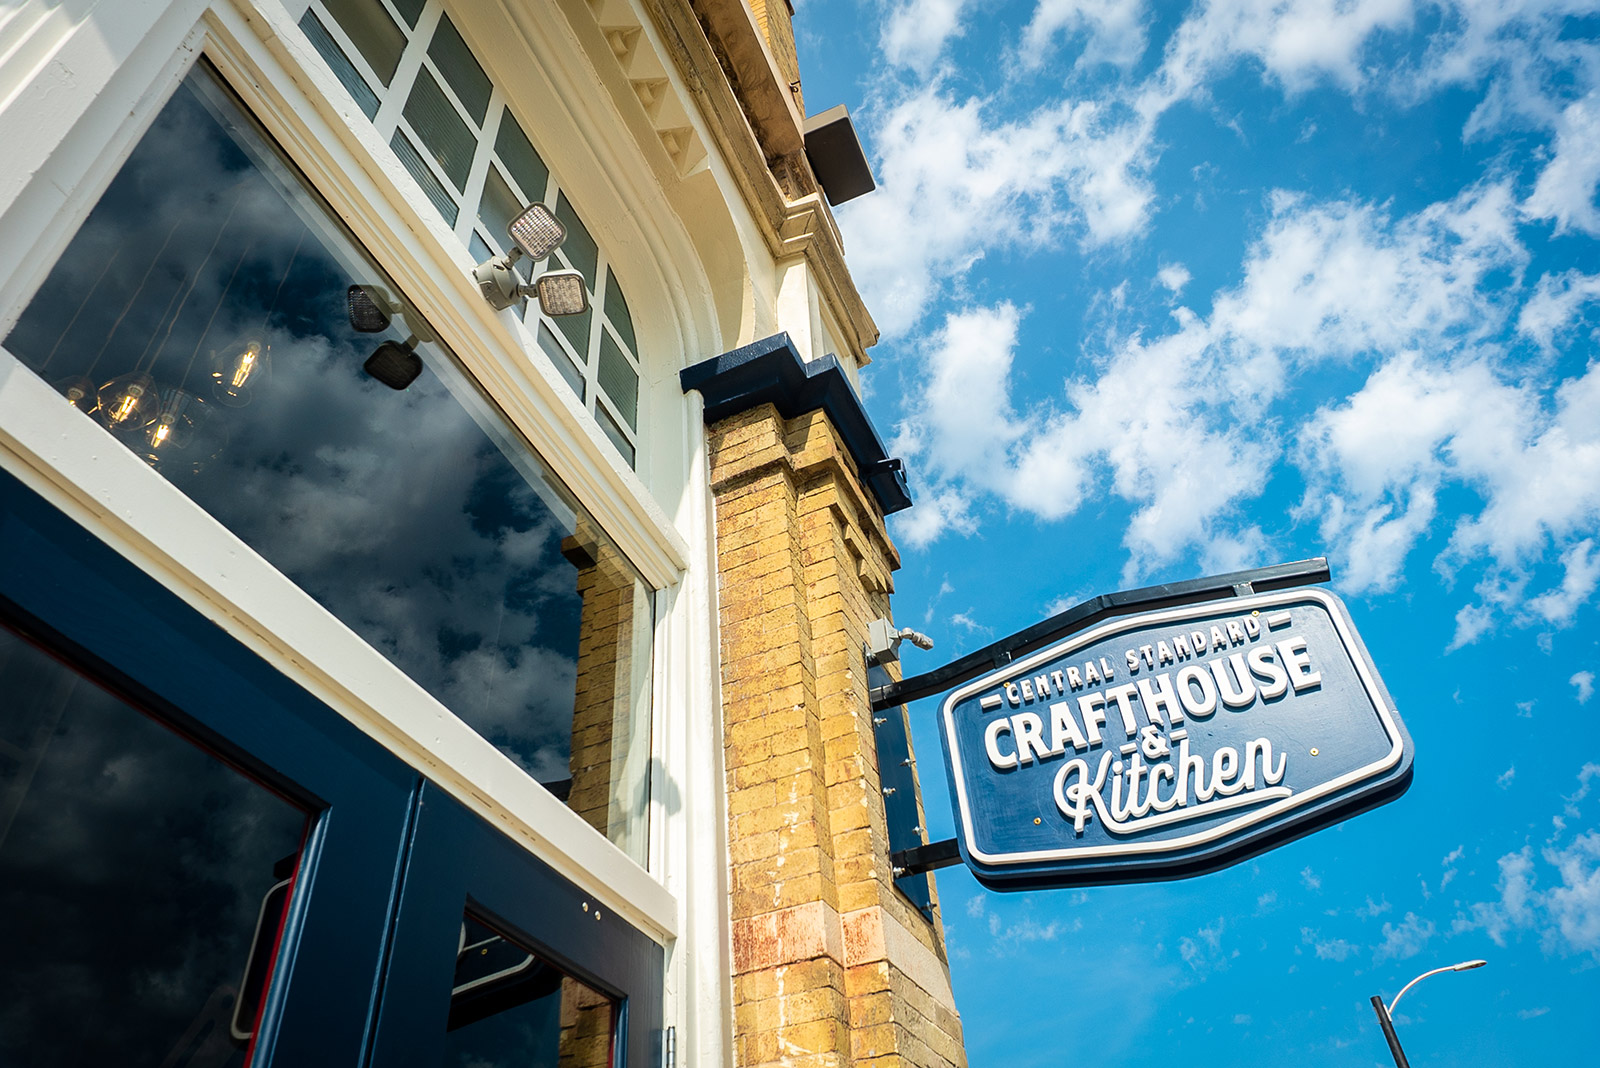 Crafthouse & Kitchen